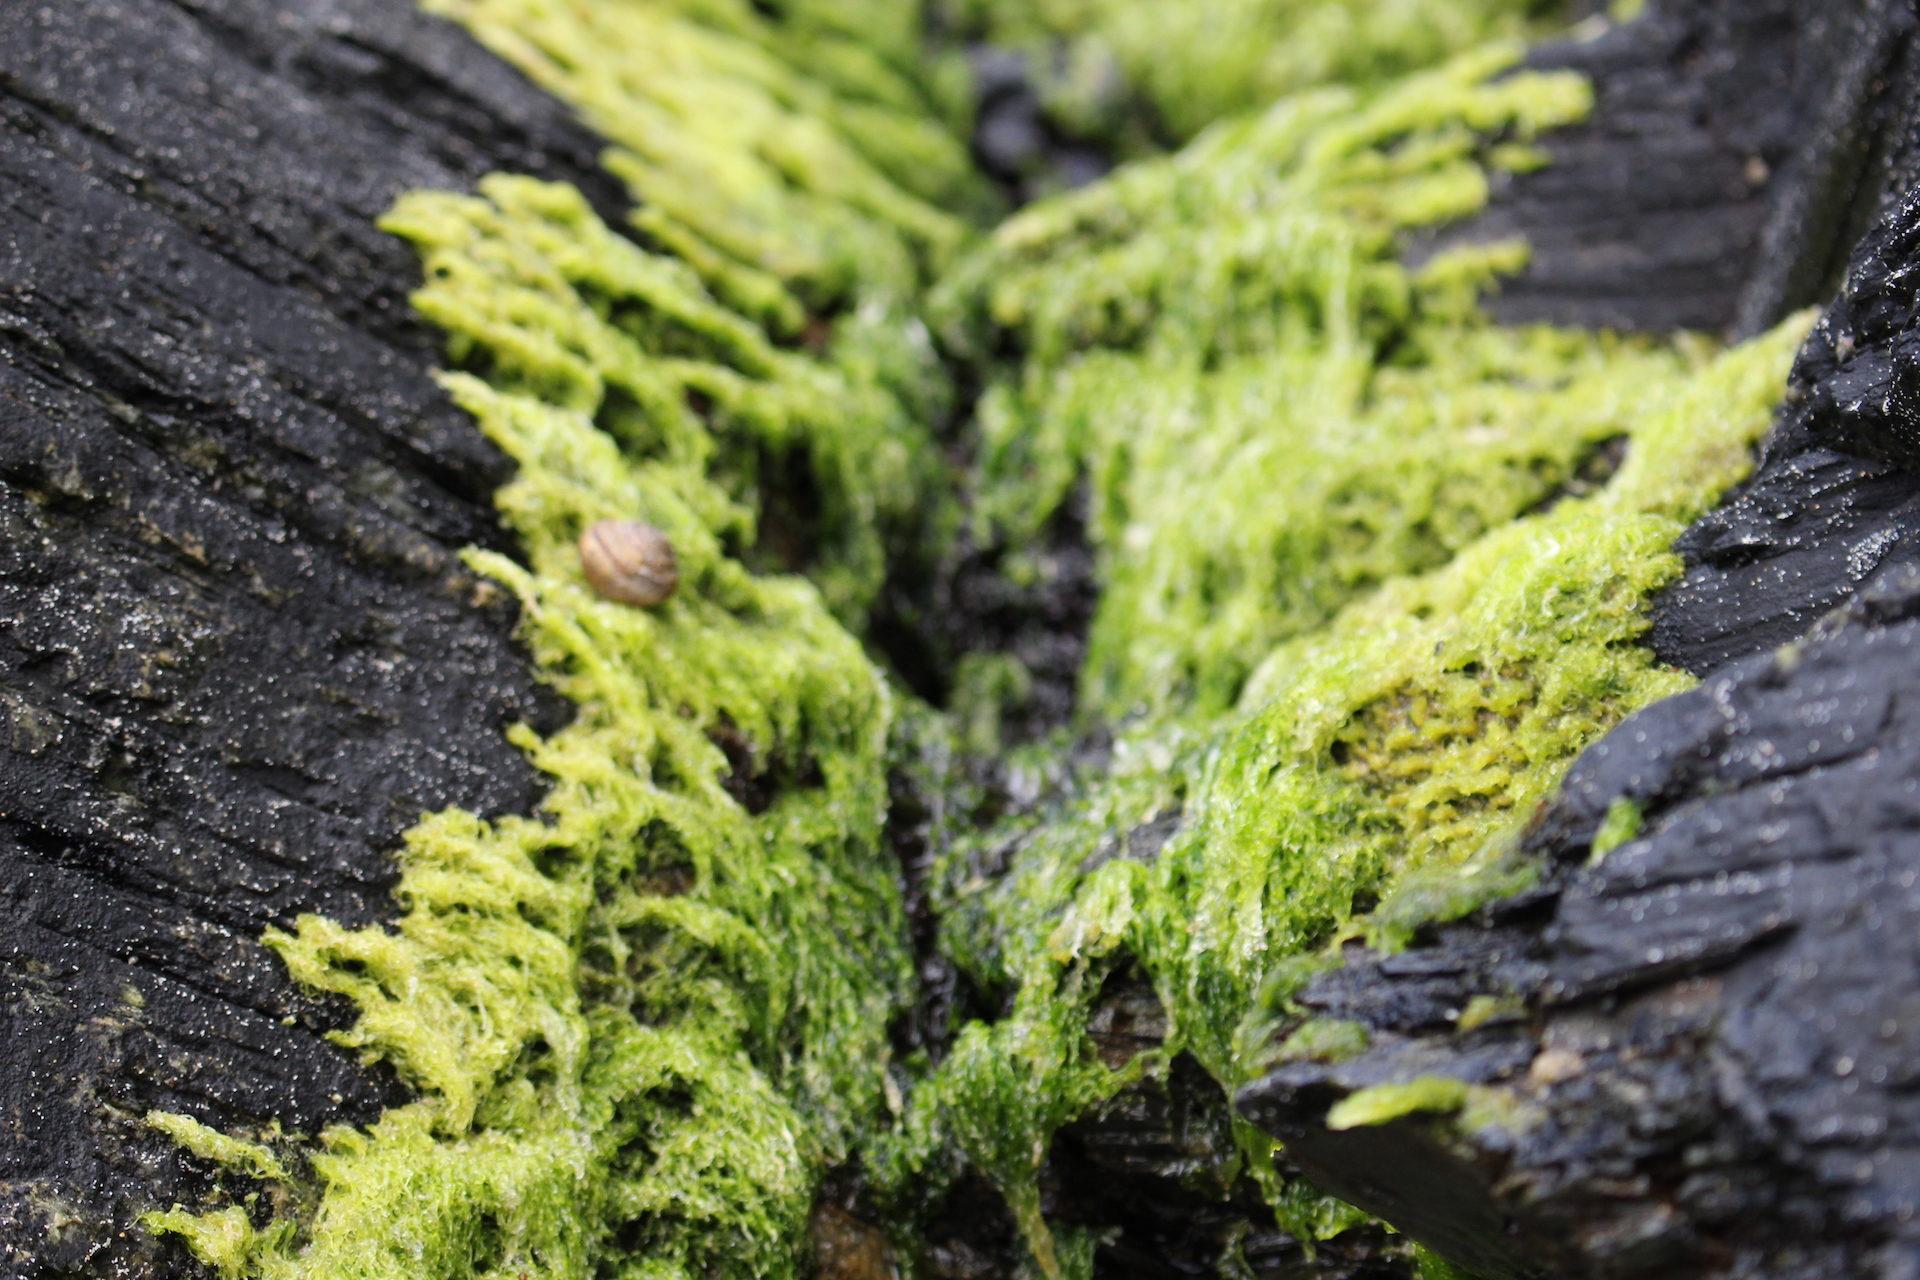 alghe, pietre, lumaca, Spiaggia, Verde - Sfondi HD - Professor-falken.com